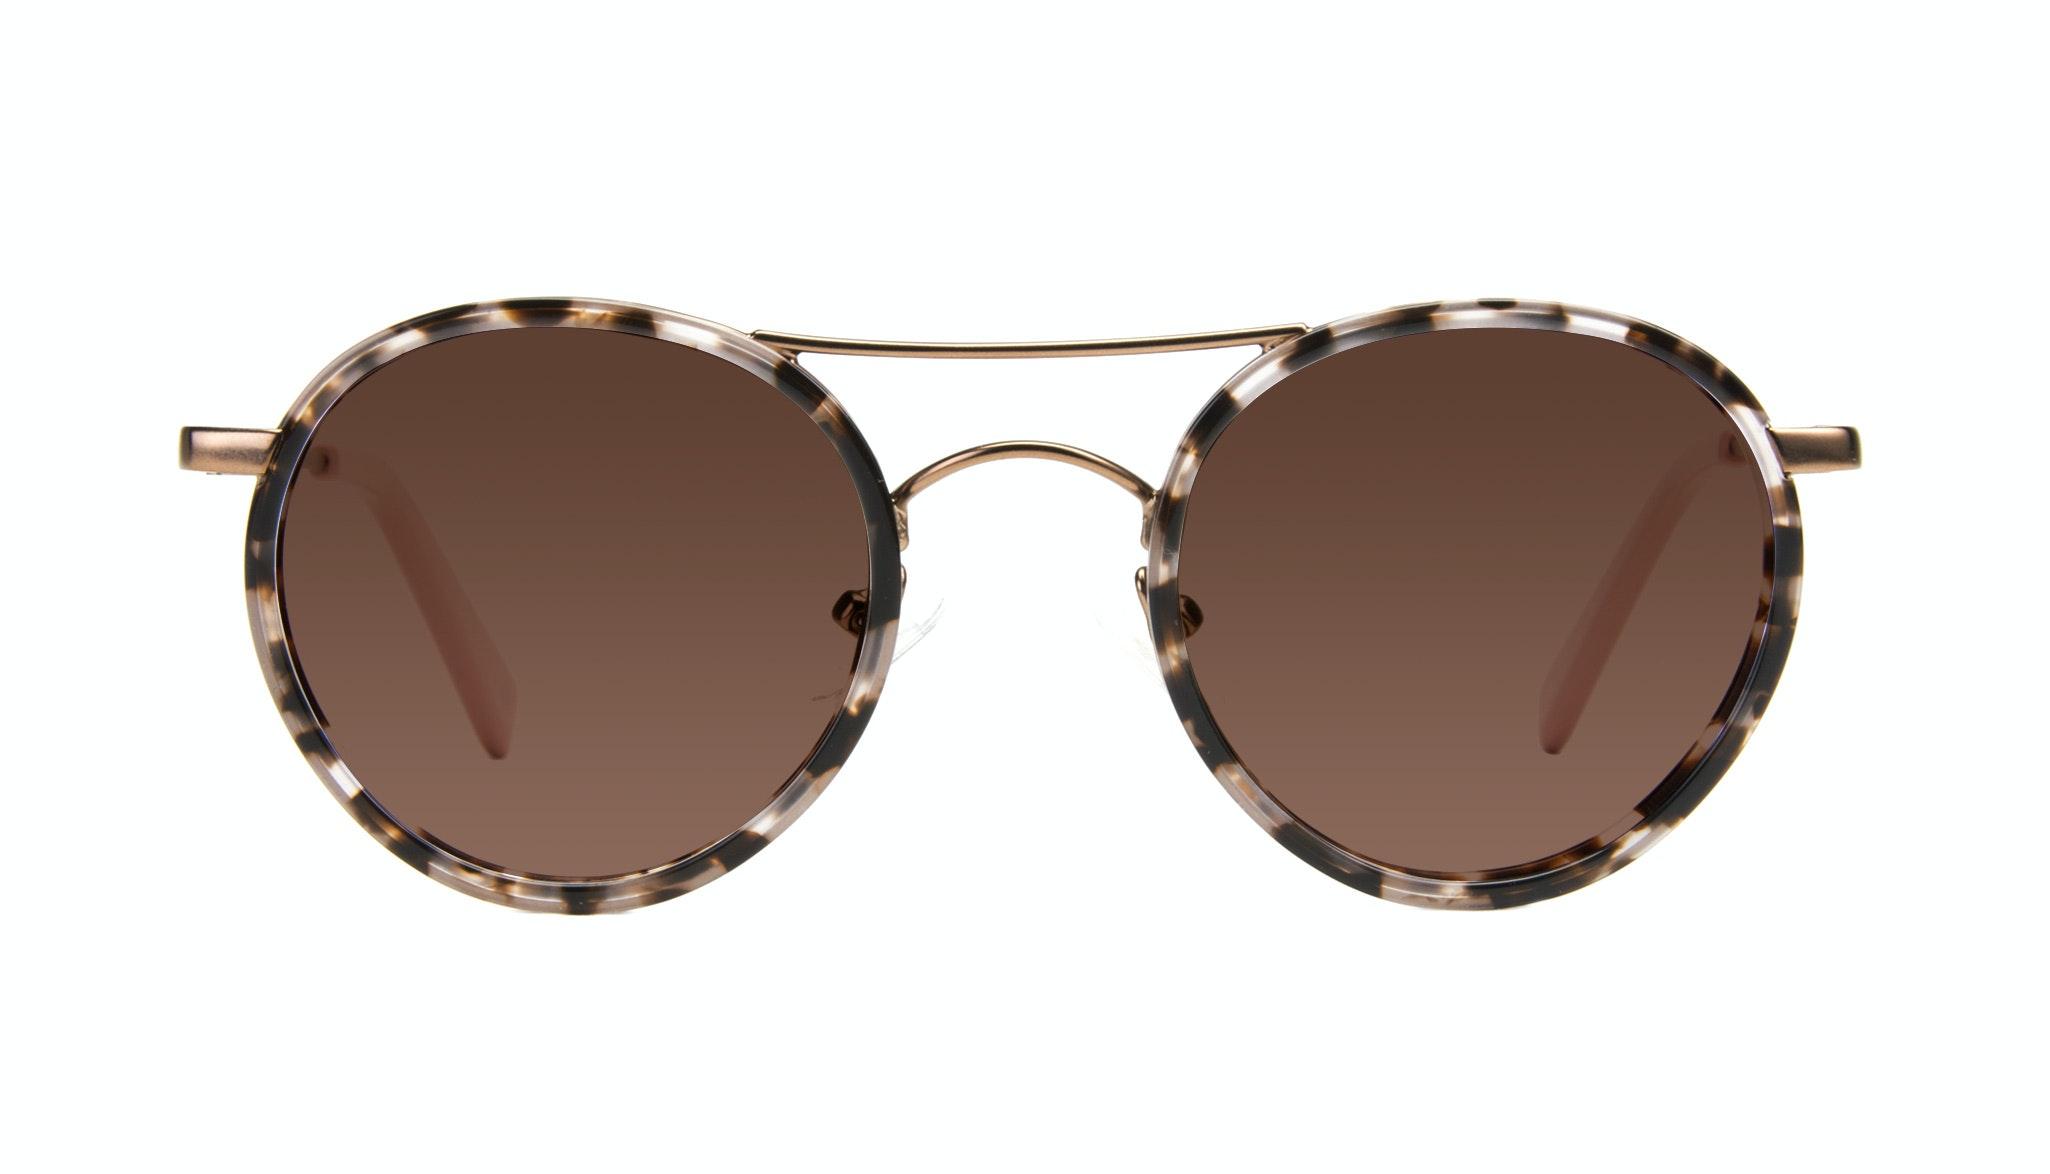 Affordable Fashion Glasses Aviator Round Sunglasses Women Chelsea Pink Tortoise